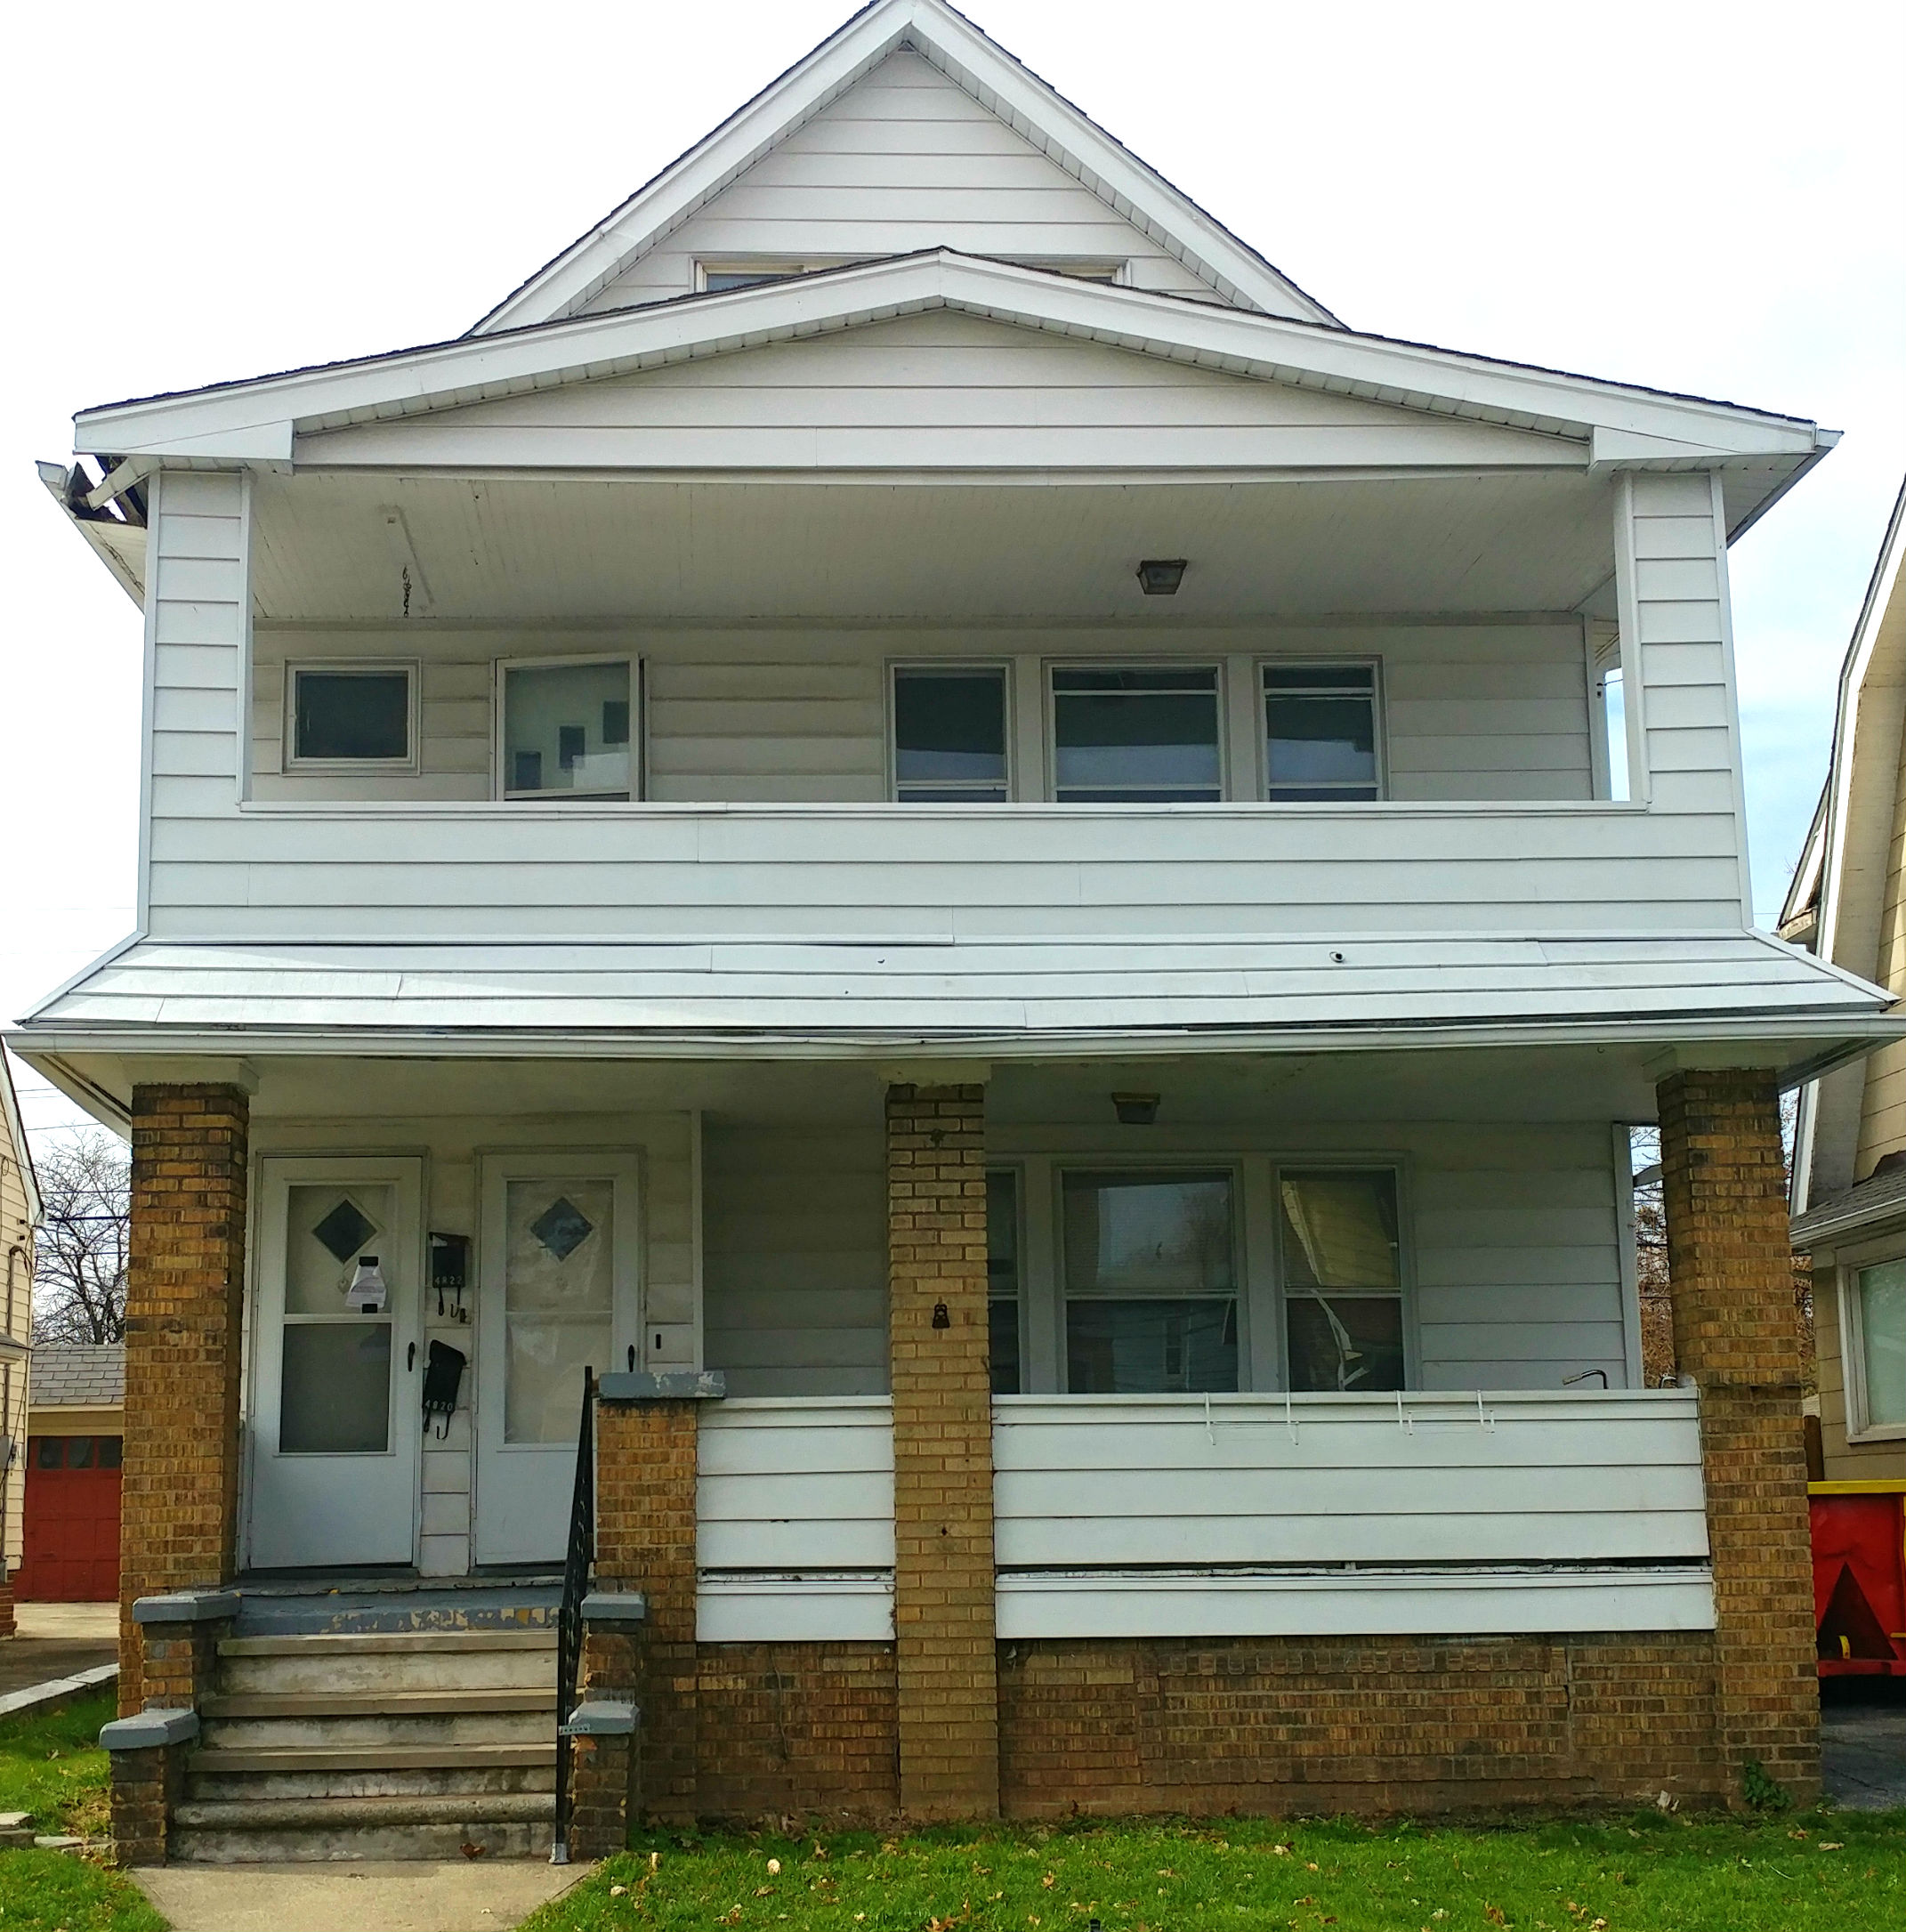 4820 E 84 St., Garfield Hts. | 6 bed 2 bath | 2,726 Sq. Ft. | $52,225